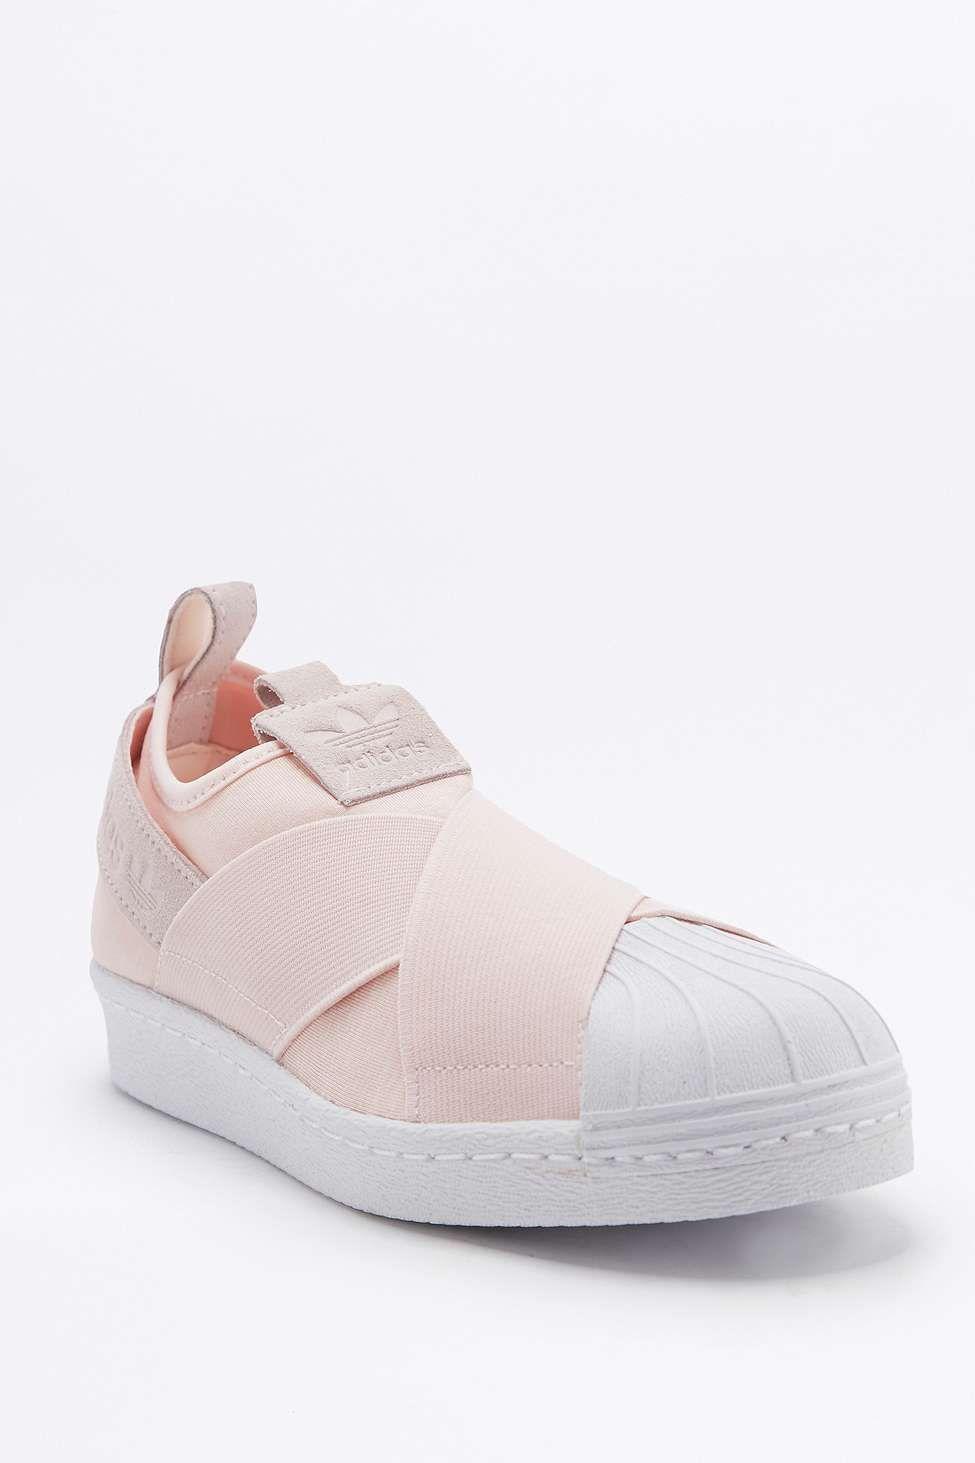 239ecba9894 adidas Originals - Baskets à enfiler Superstar roses